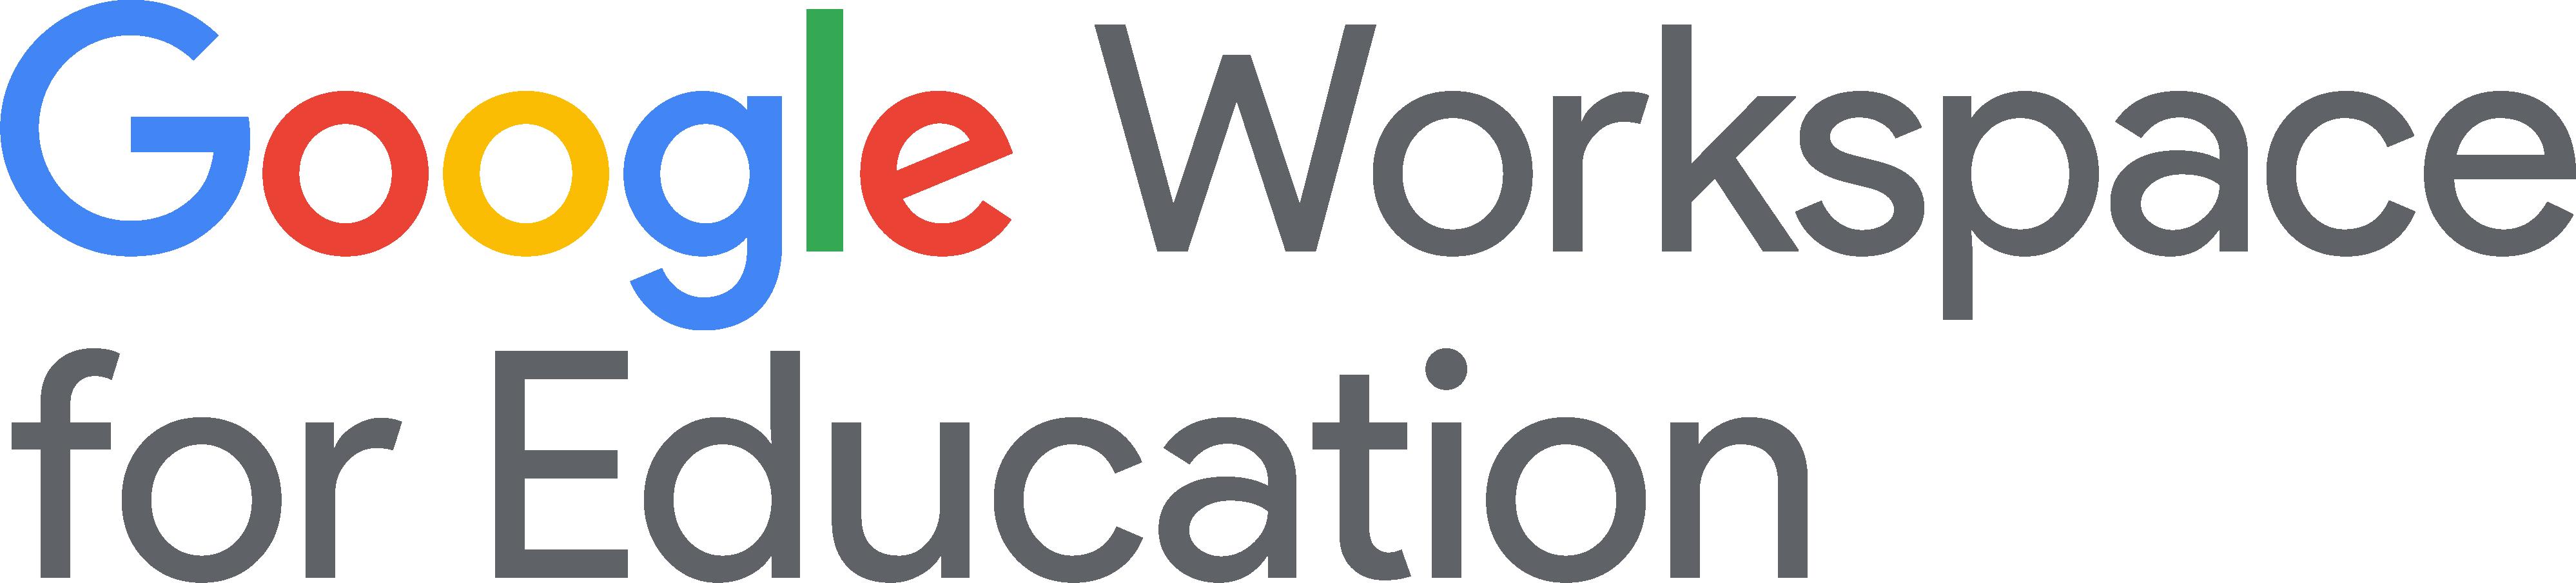 Lockup_Google_Workspace_Edu_vert_clr (2)-1